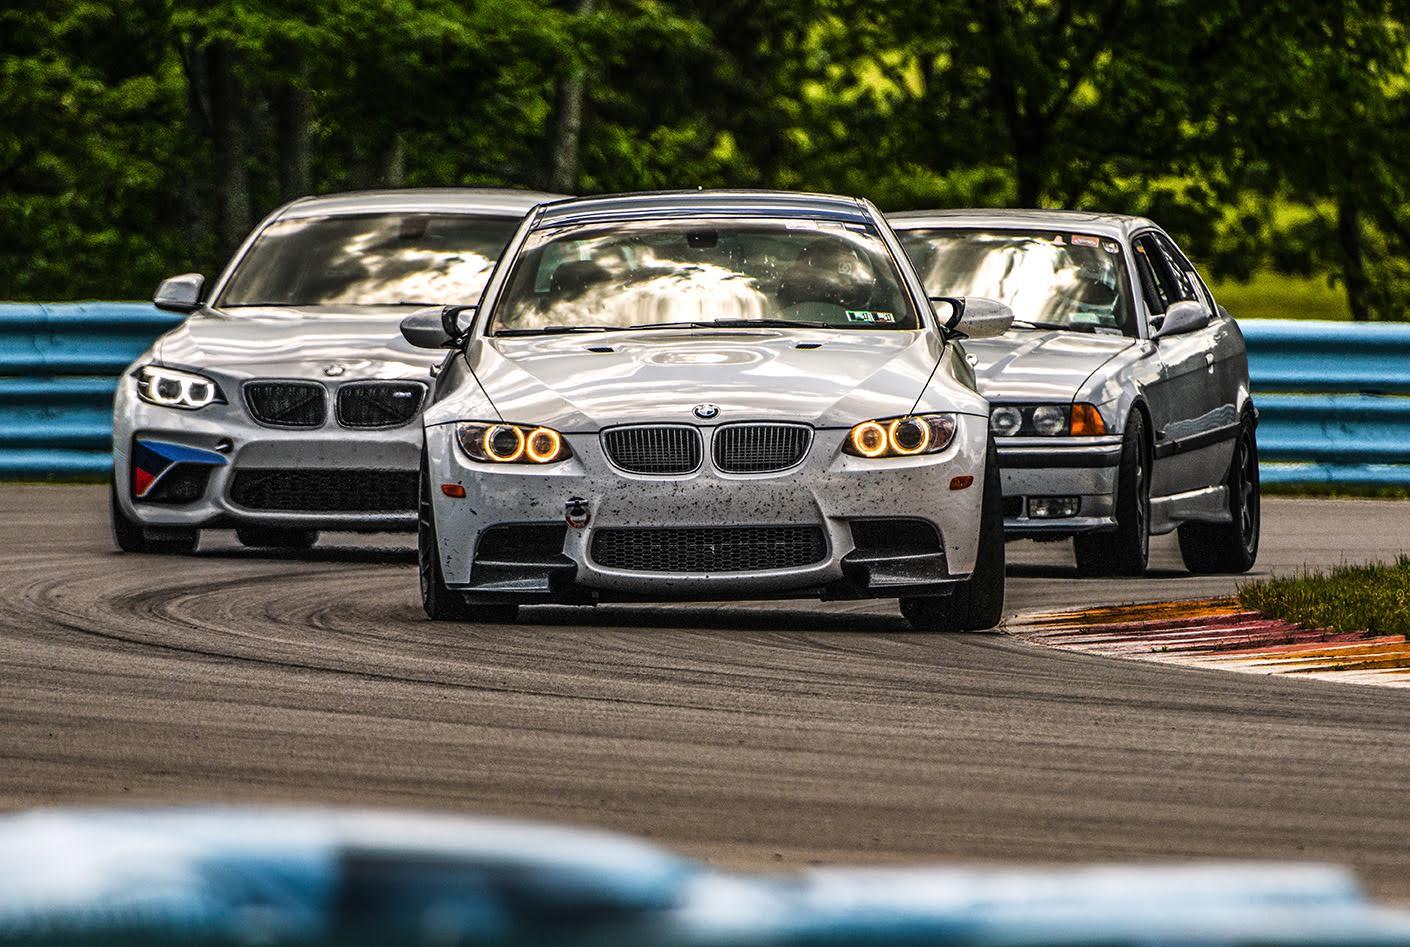 COM Sports Car Club at Watkins Glen International — The Little Speed Shop